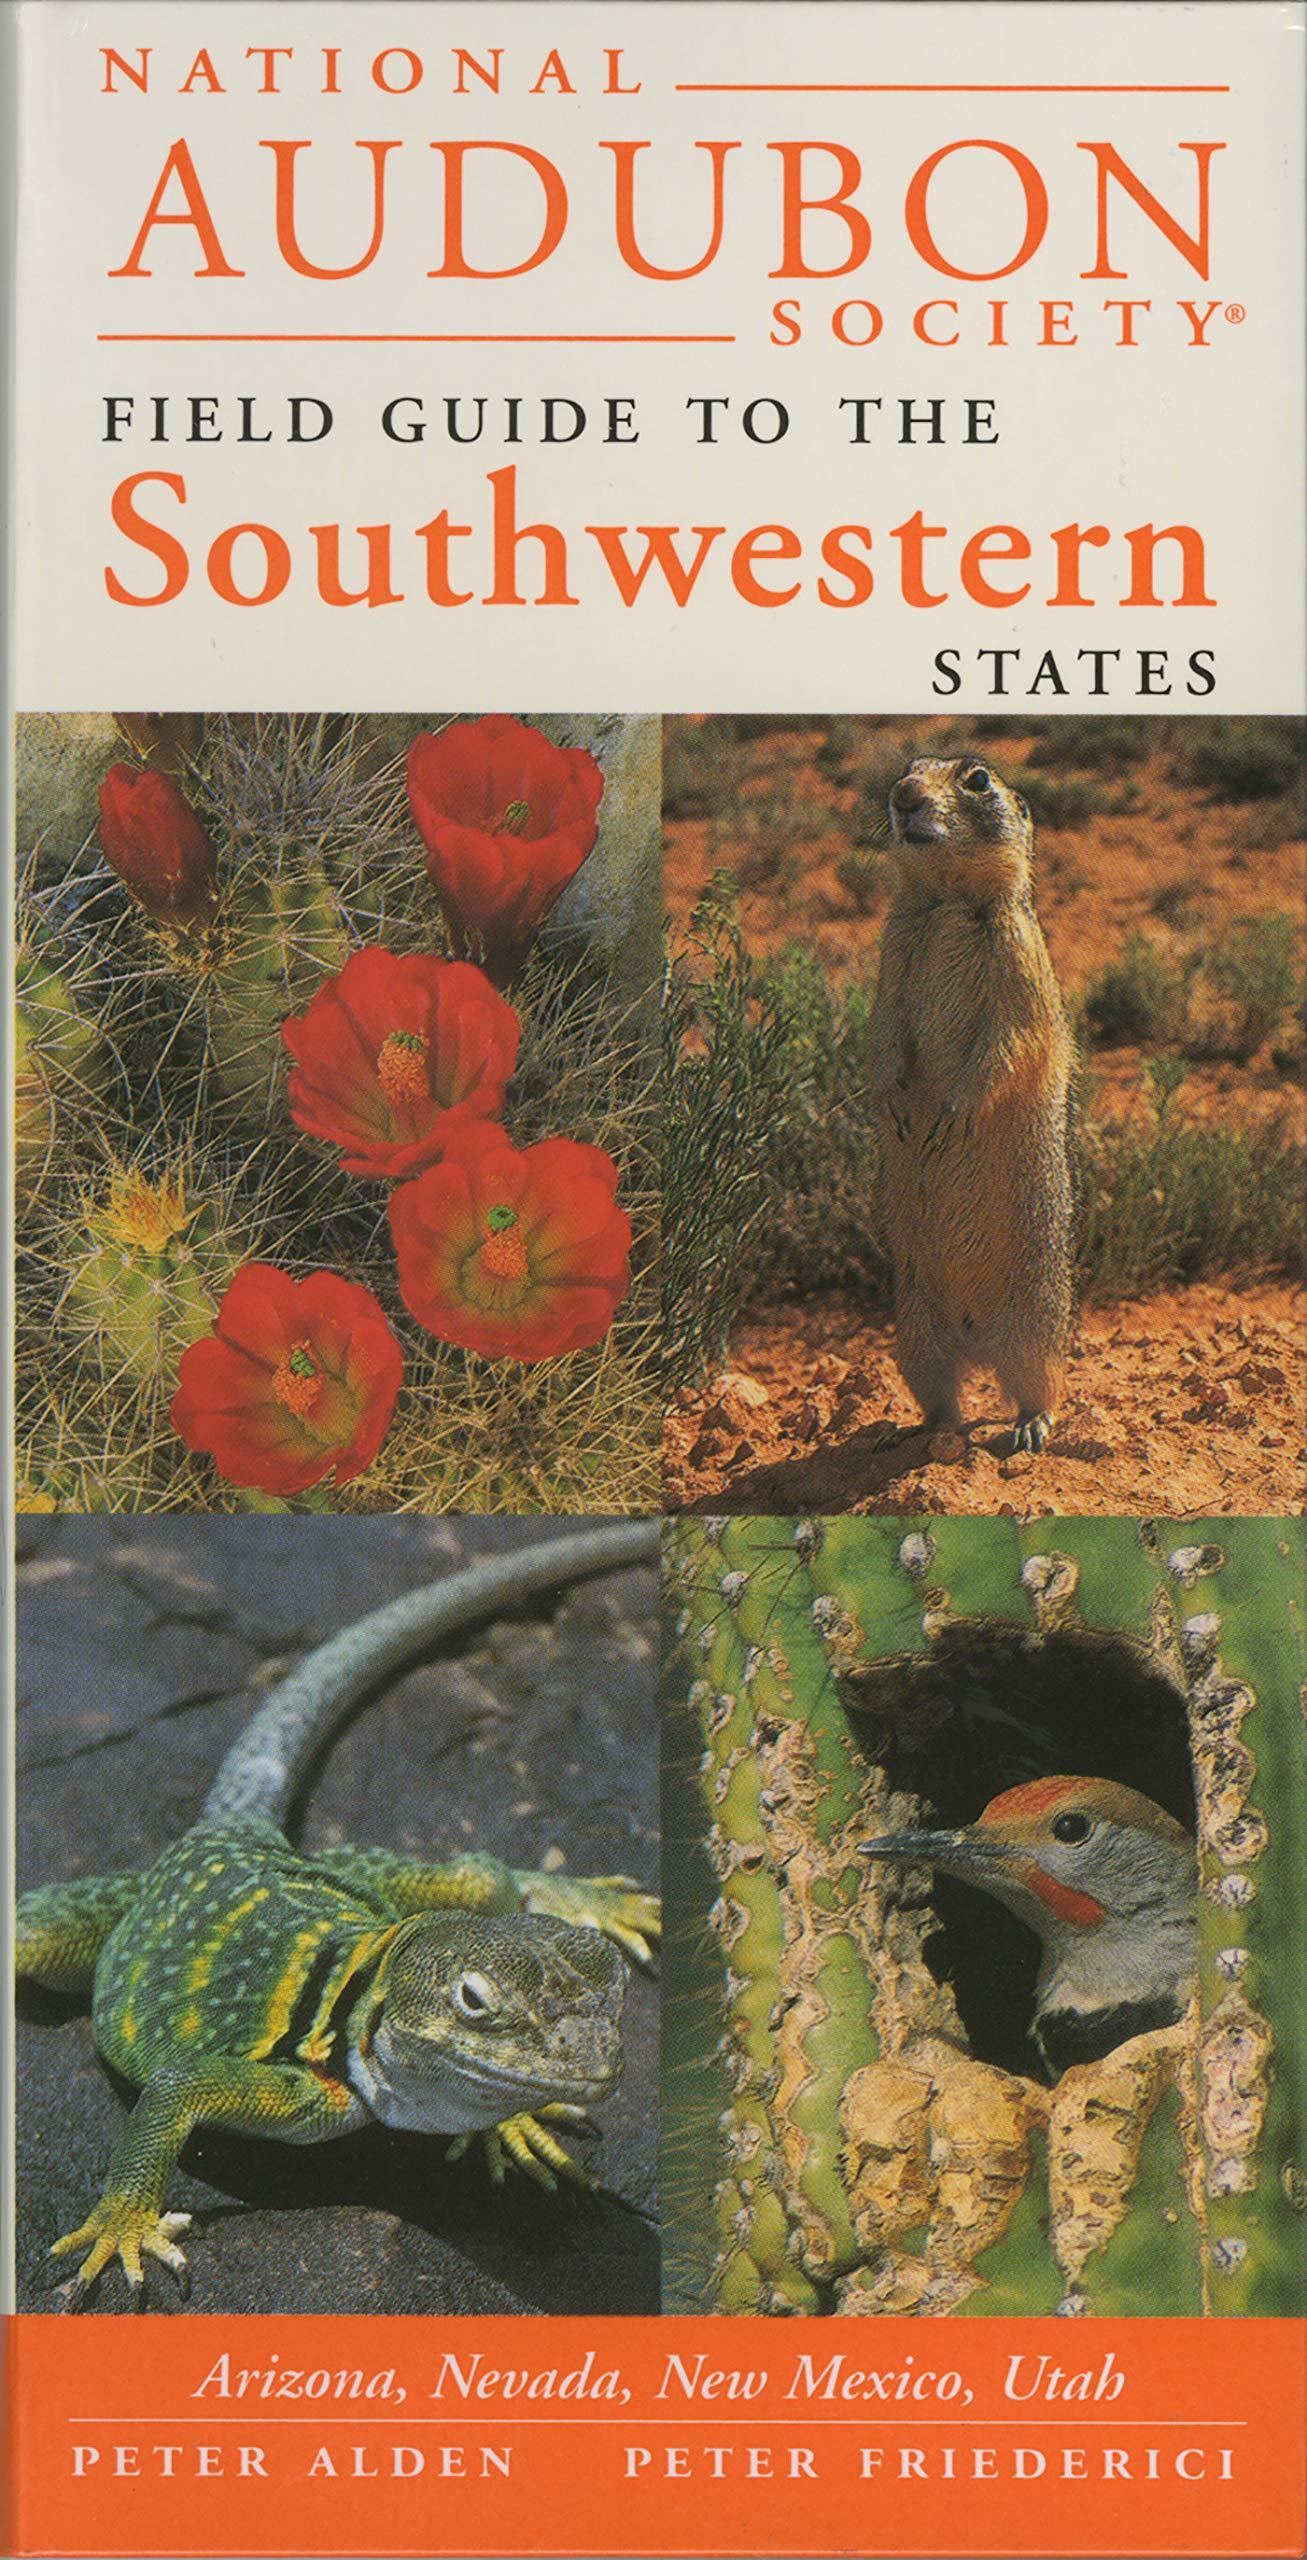 National Audubon Society Regional Guide To The Southwestern States  Arizona New Mexico Nevada Utah  National Audubon Society Field Guides